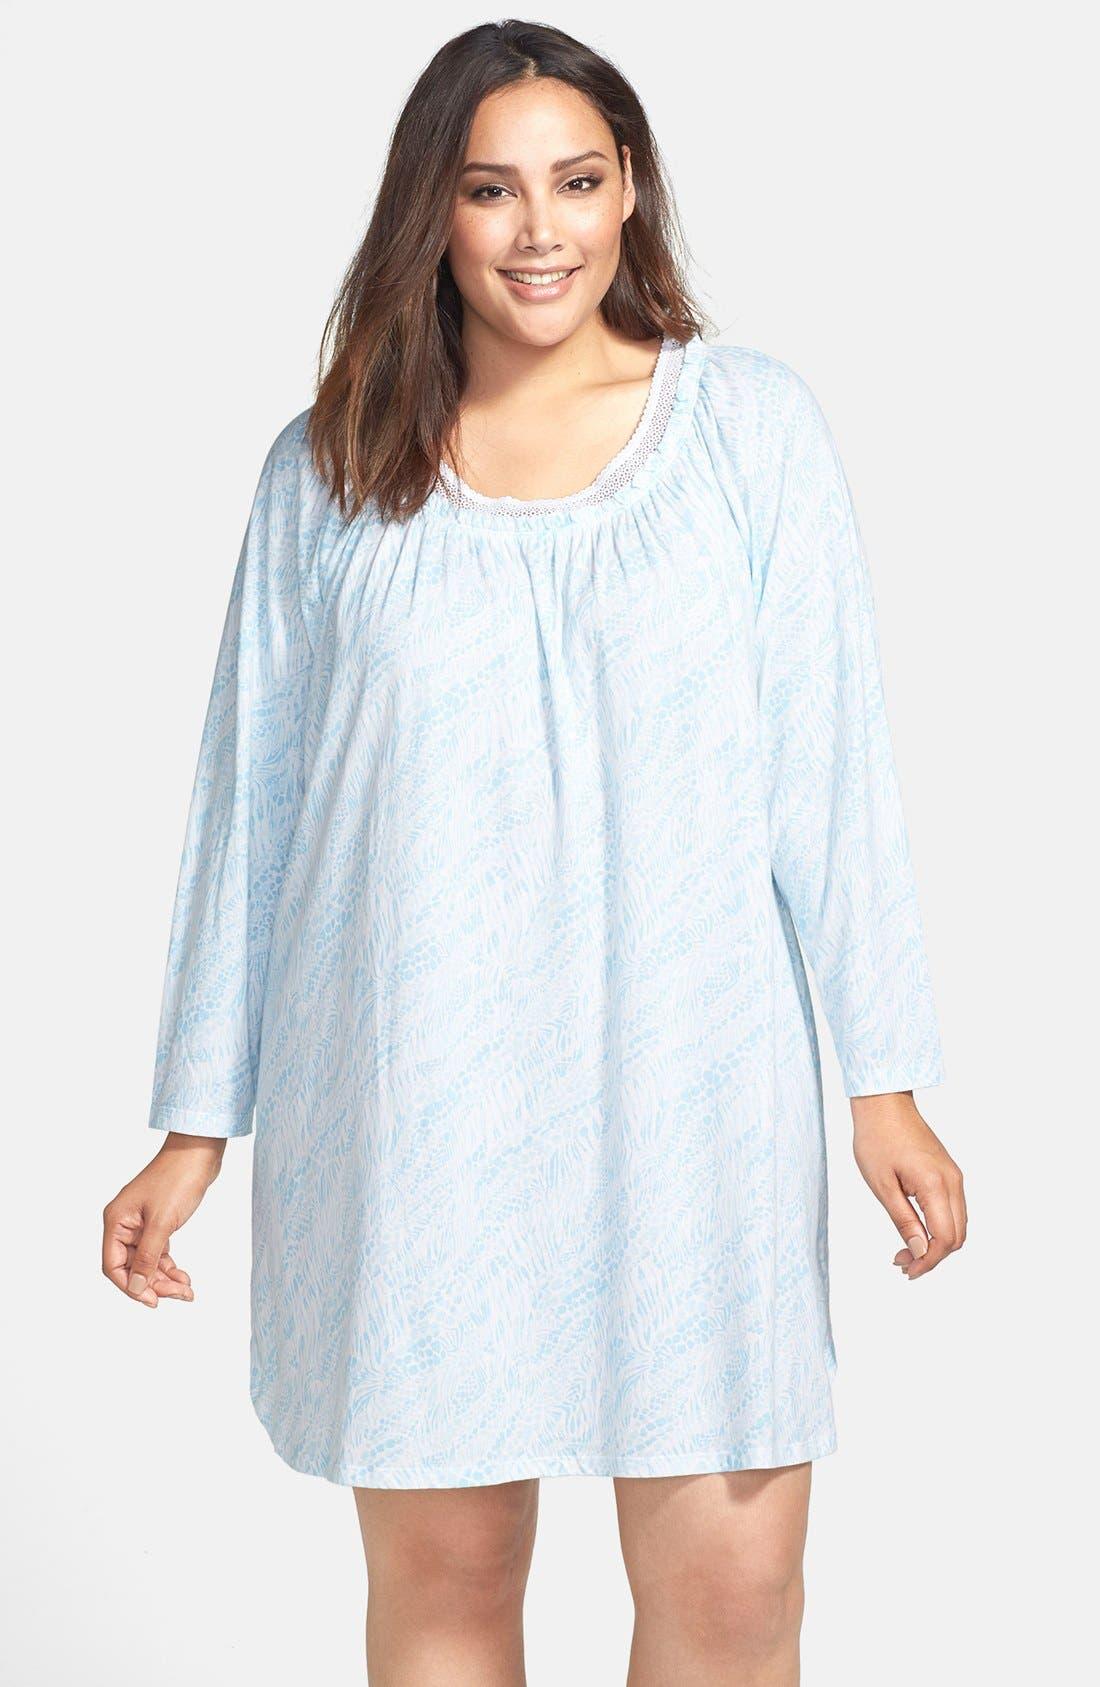 Main Image - Carole Hochman Designs 'Wistful Rosebud' Sleep Shirt (Plus Size)